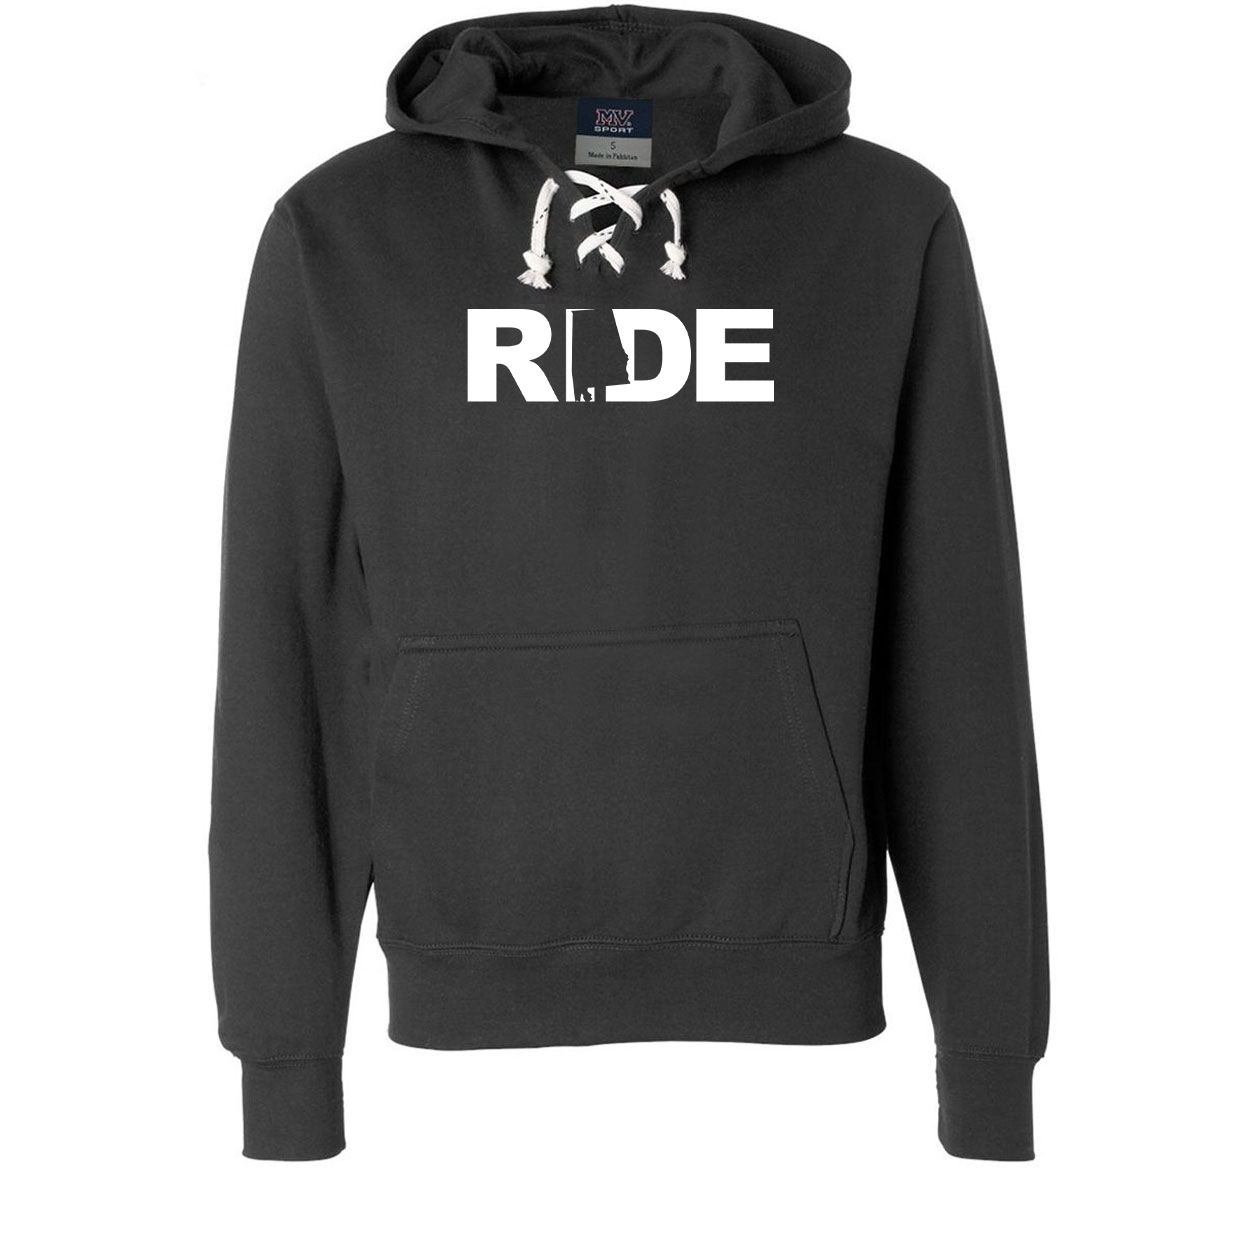 Ride Alabama Classic Unisex Premium Hockey Sweatshirt Black (White Logo)